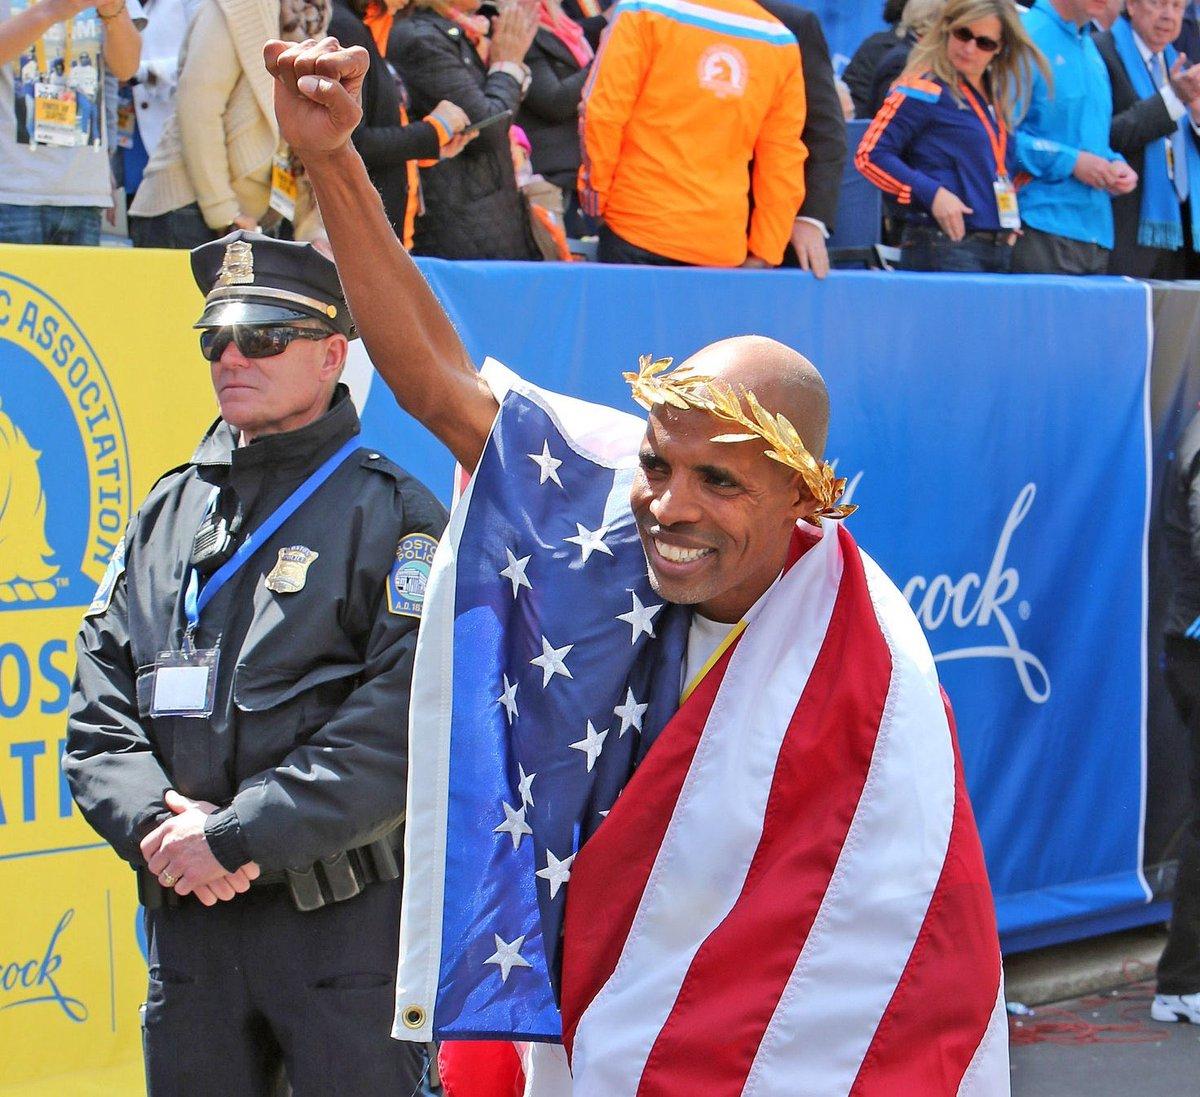 Wishing a very Happy Birthday to 2014 Boston Marathon champion and six-time Boston finisher @runmeb! 🇺🇸🥇🦄